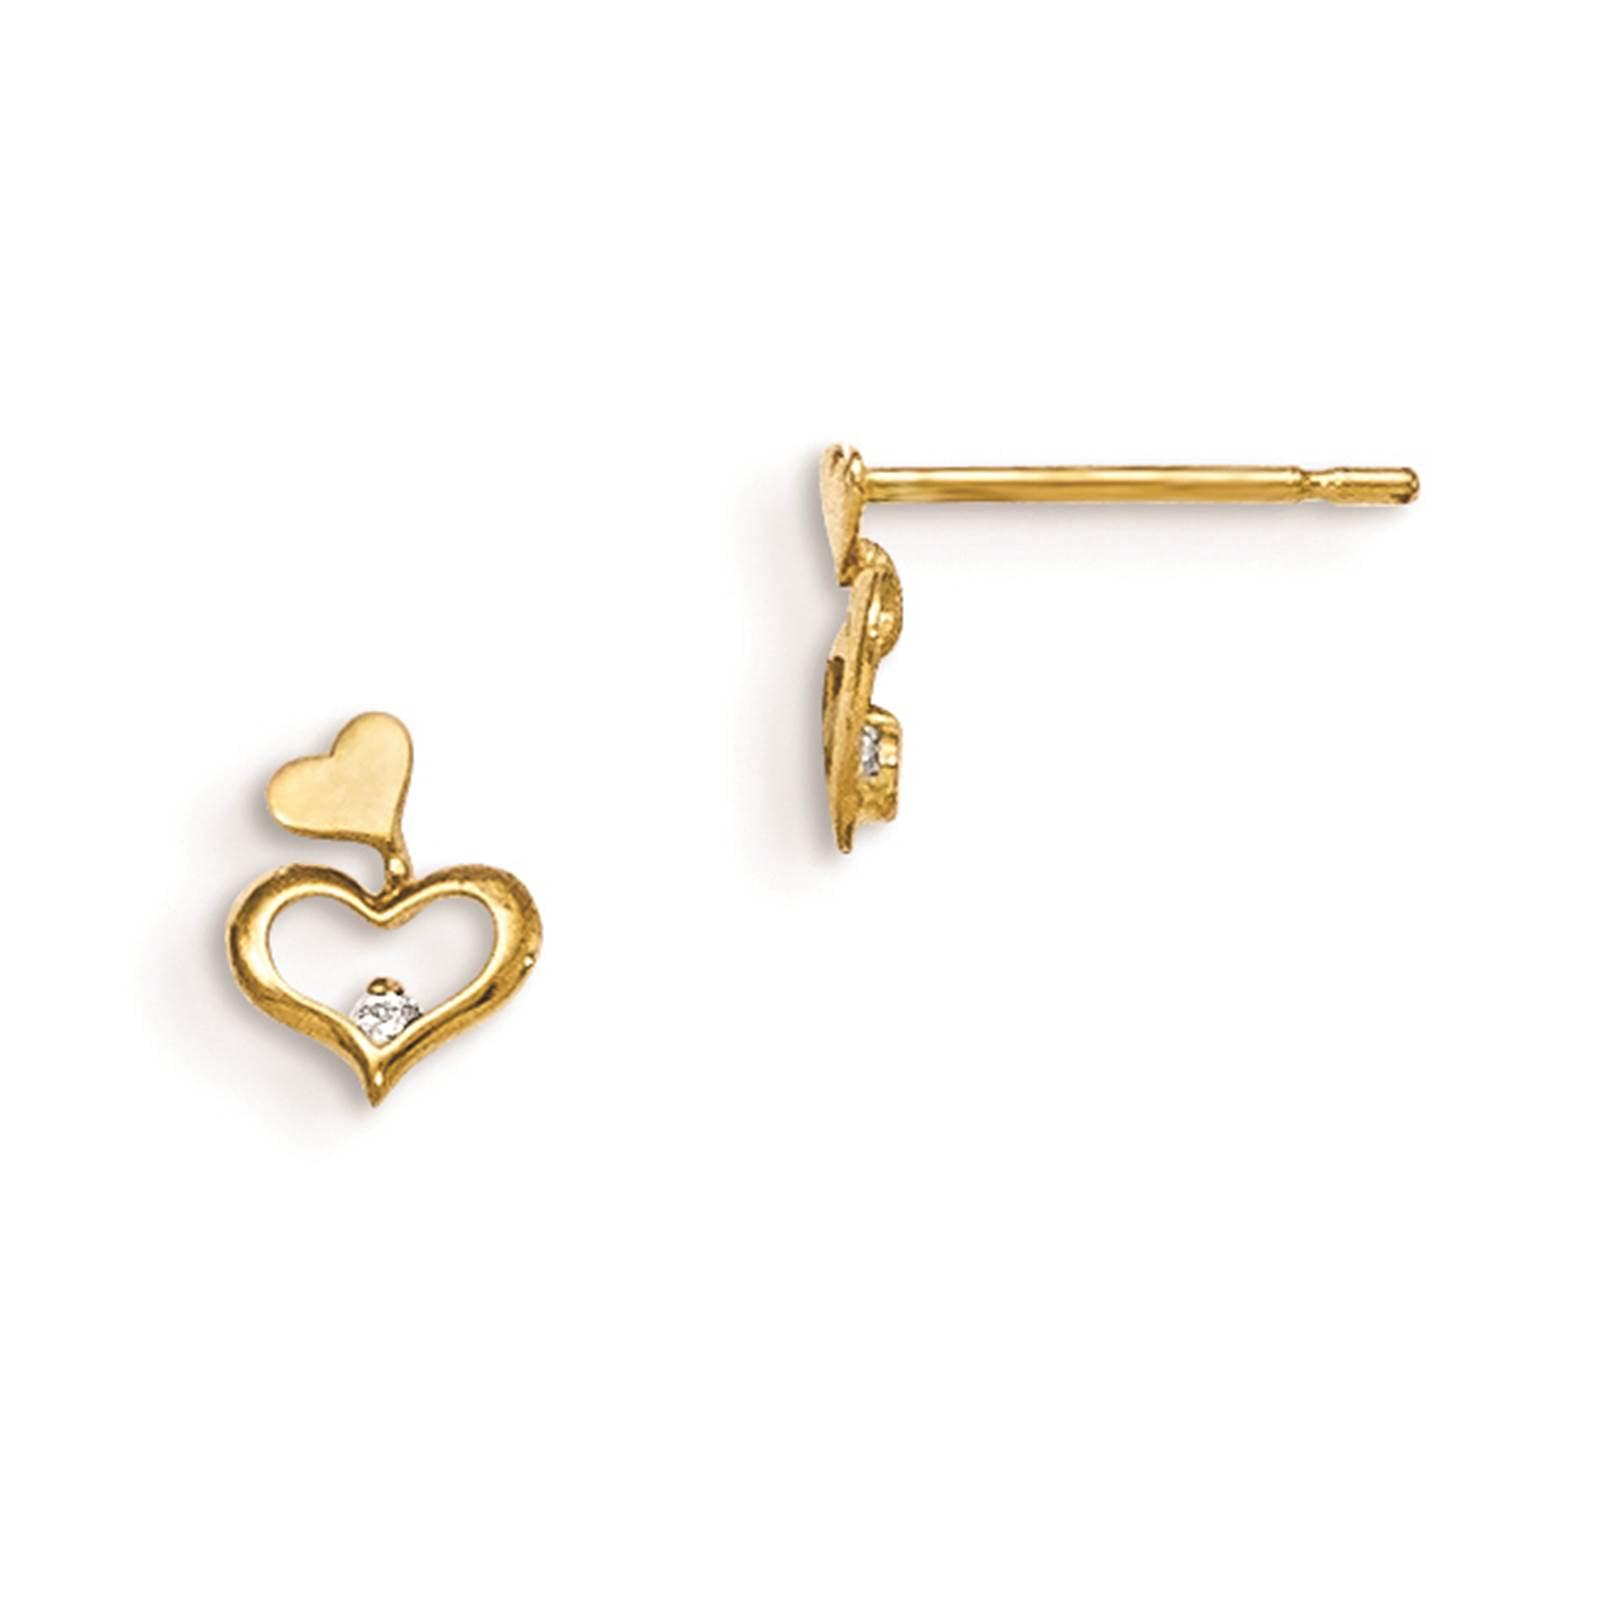 Madi K 14k Yellow Gold & Children's Heart CZ Post Polished Earrings